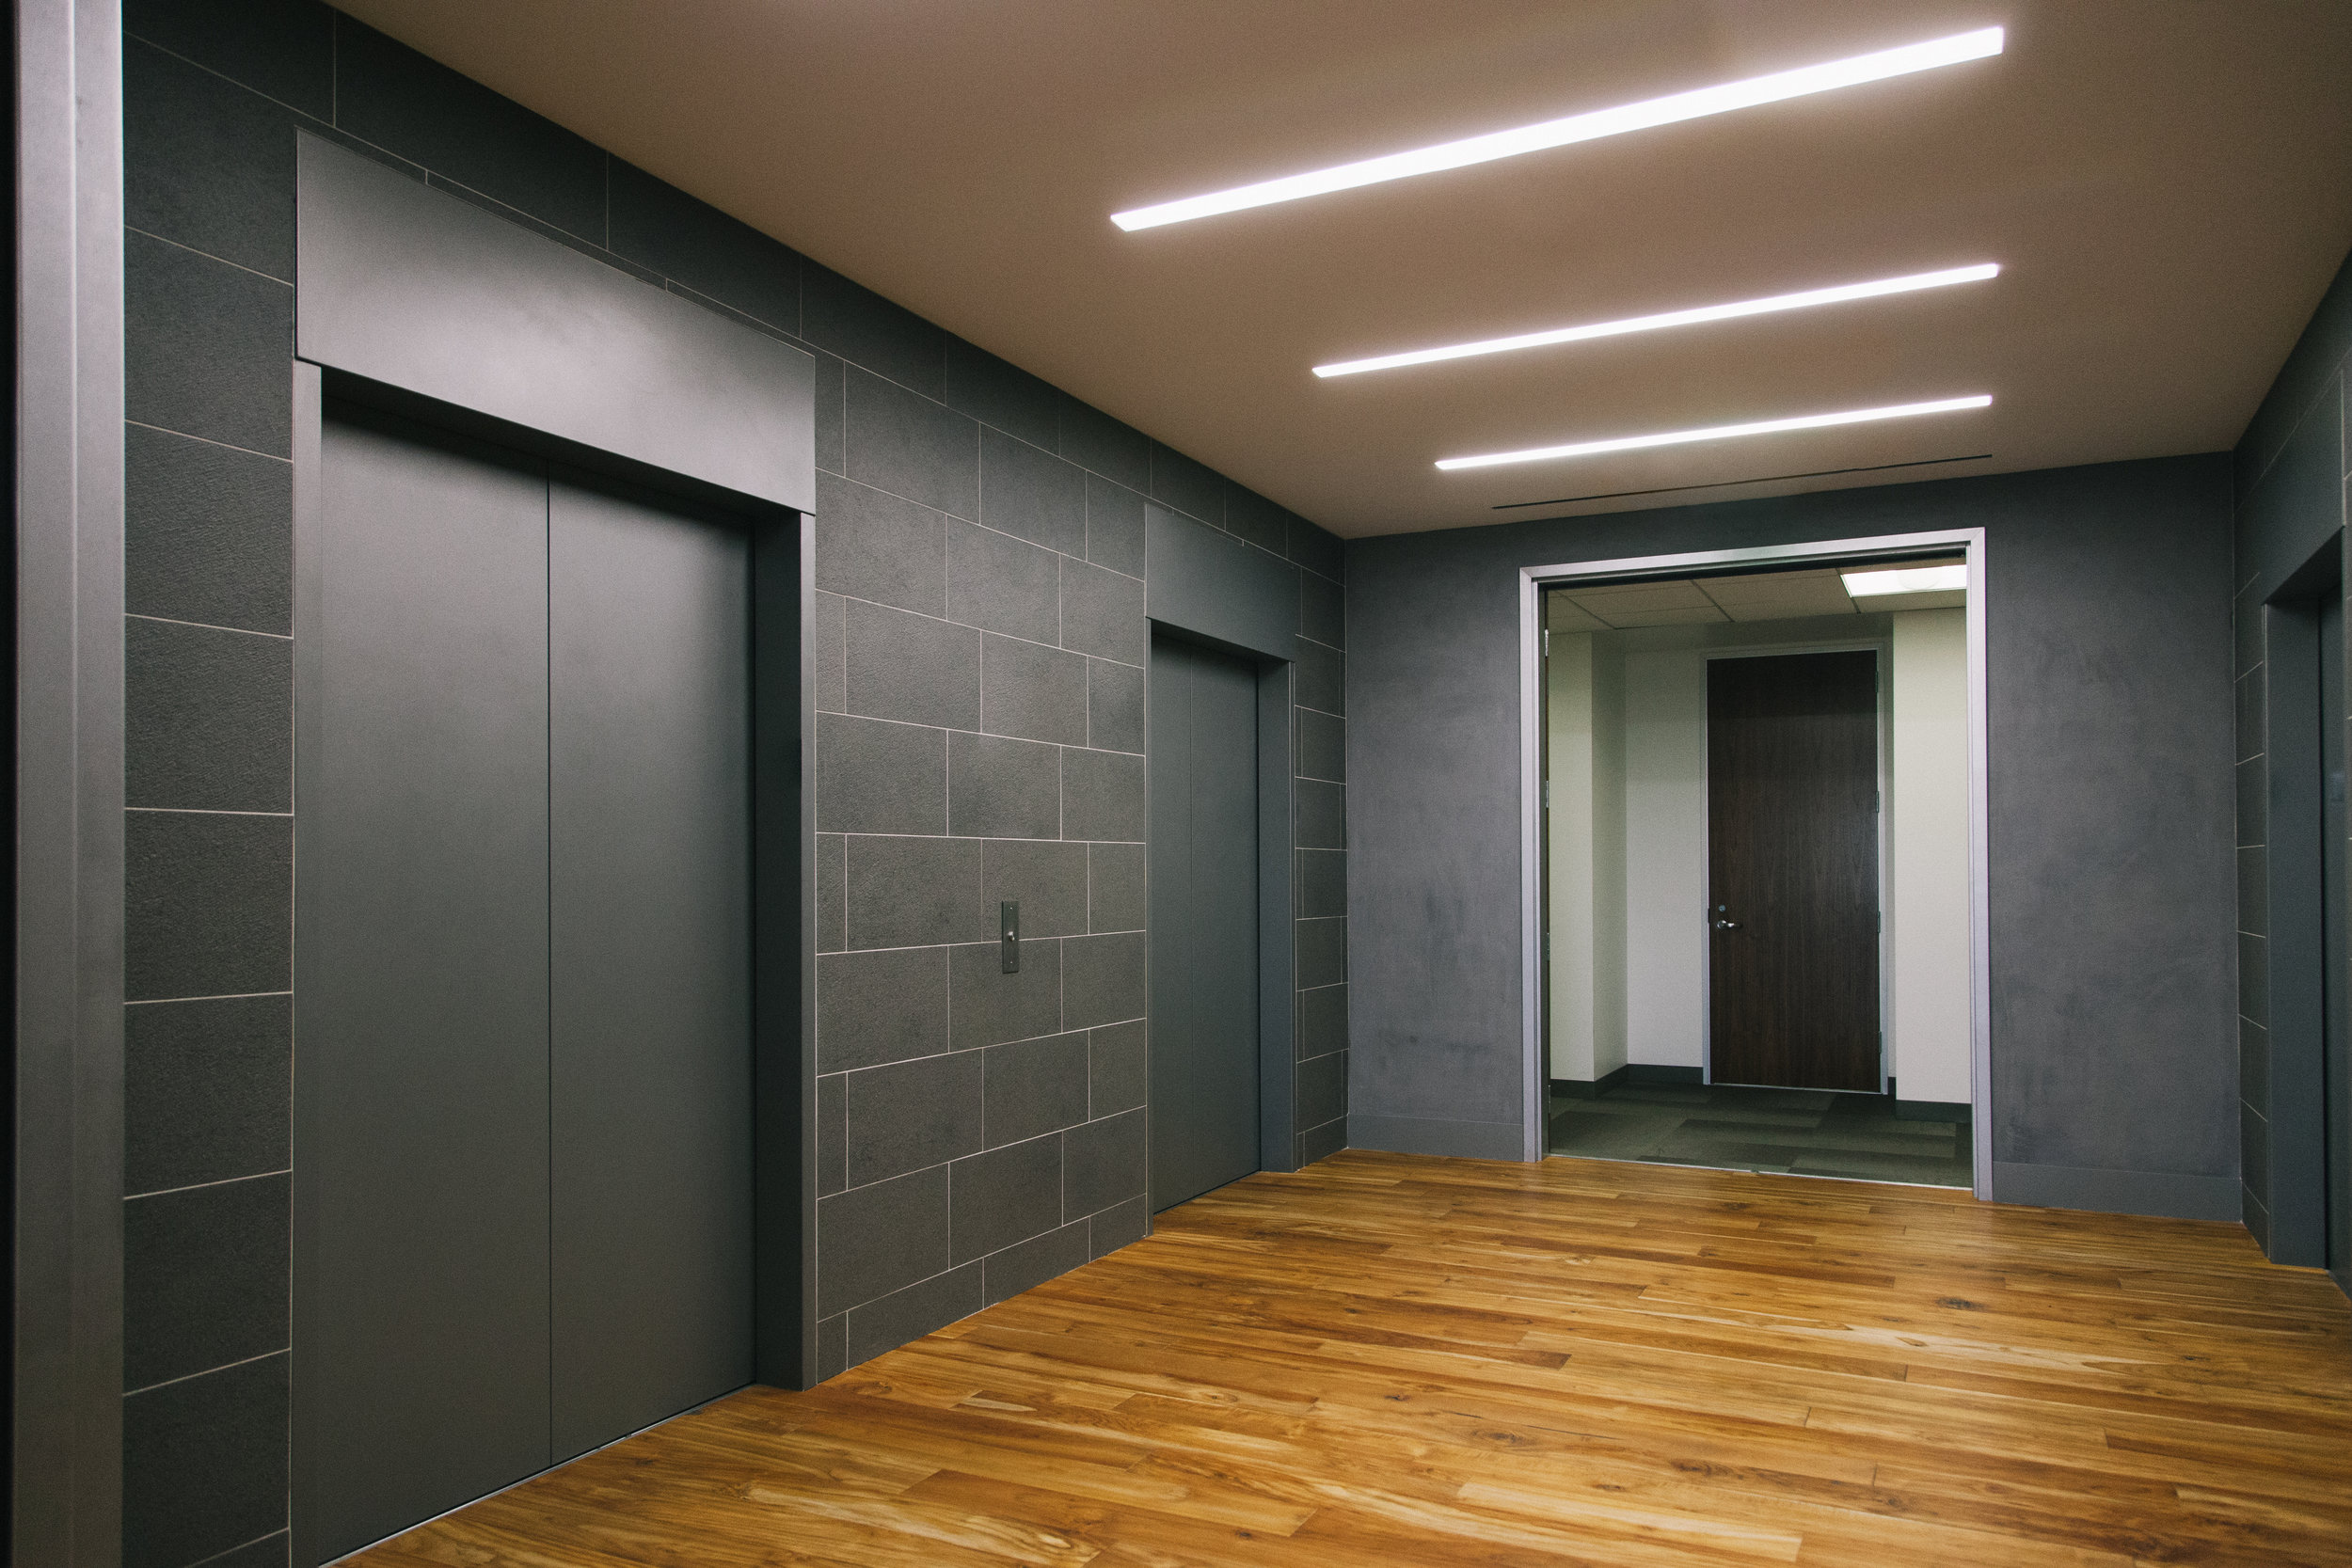 S.E.A.-Studio-Environmental-Architecture-David-Hertz-FAIA-First-Pacific-Advisors-Los-Angeles-tenant-improvement-sustainable-regenerative-restorative-green-design-office-sleek-modern-interior-Westside-commercial-building-professional-workplace-7.jpg